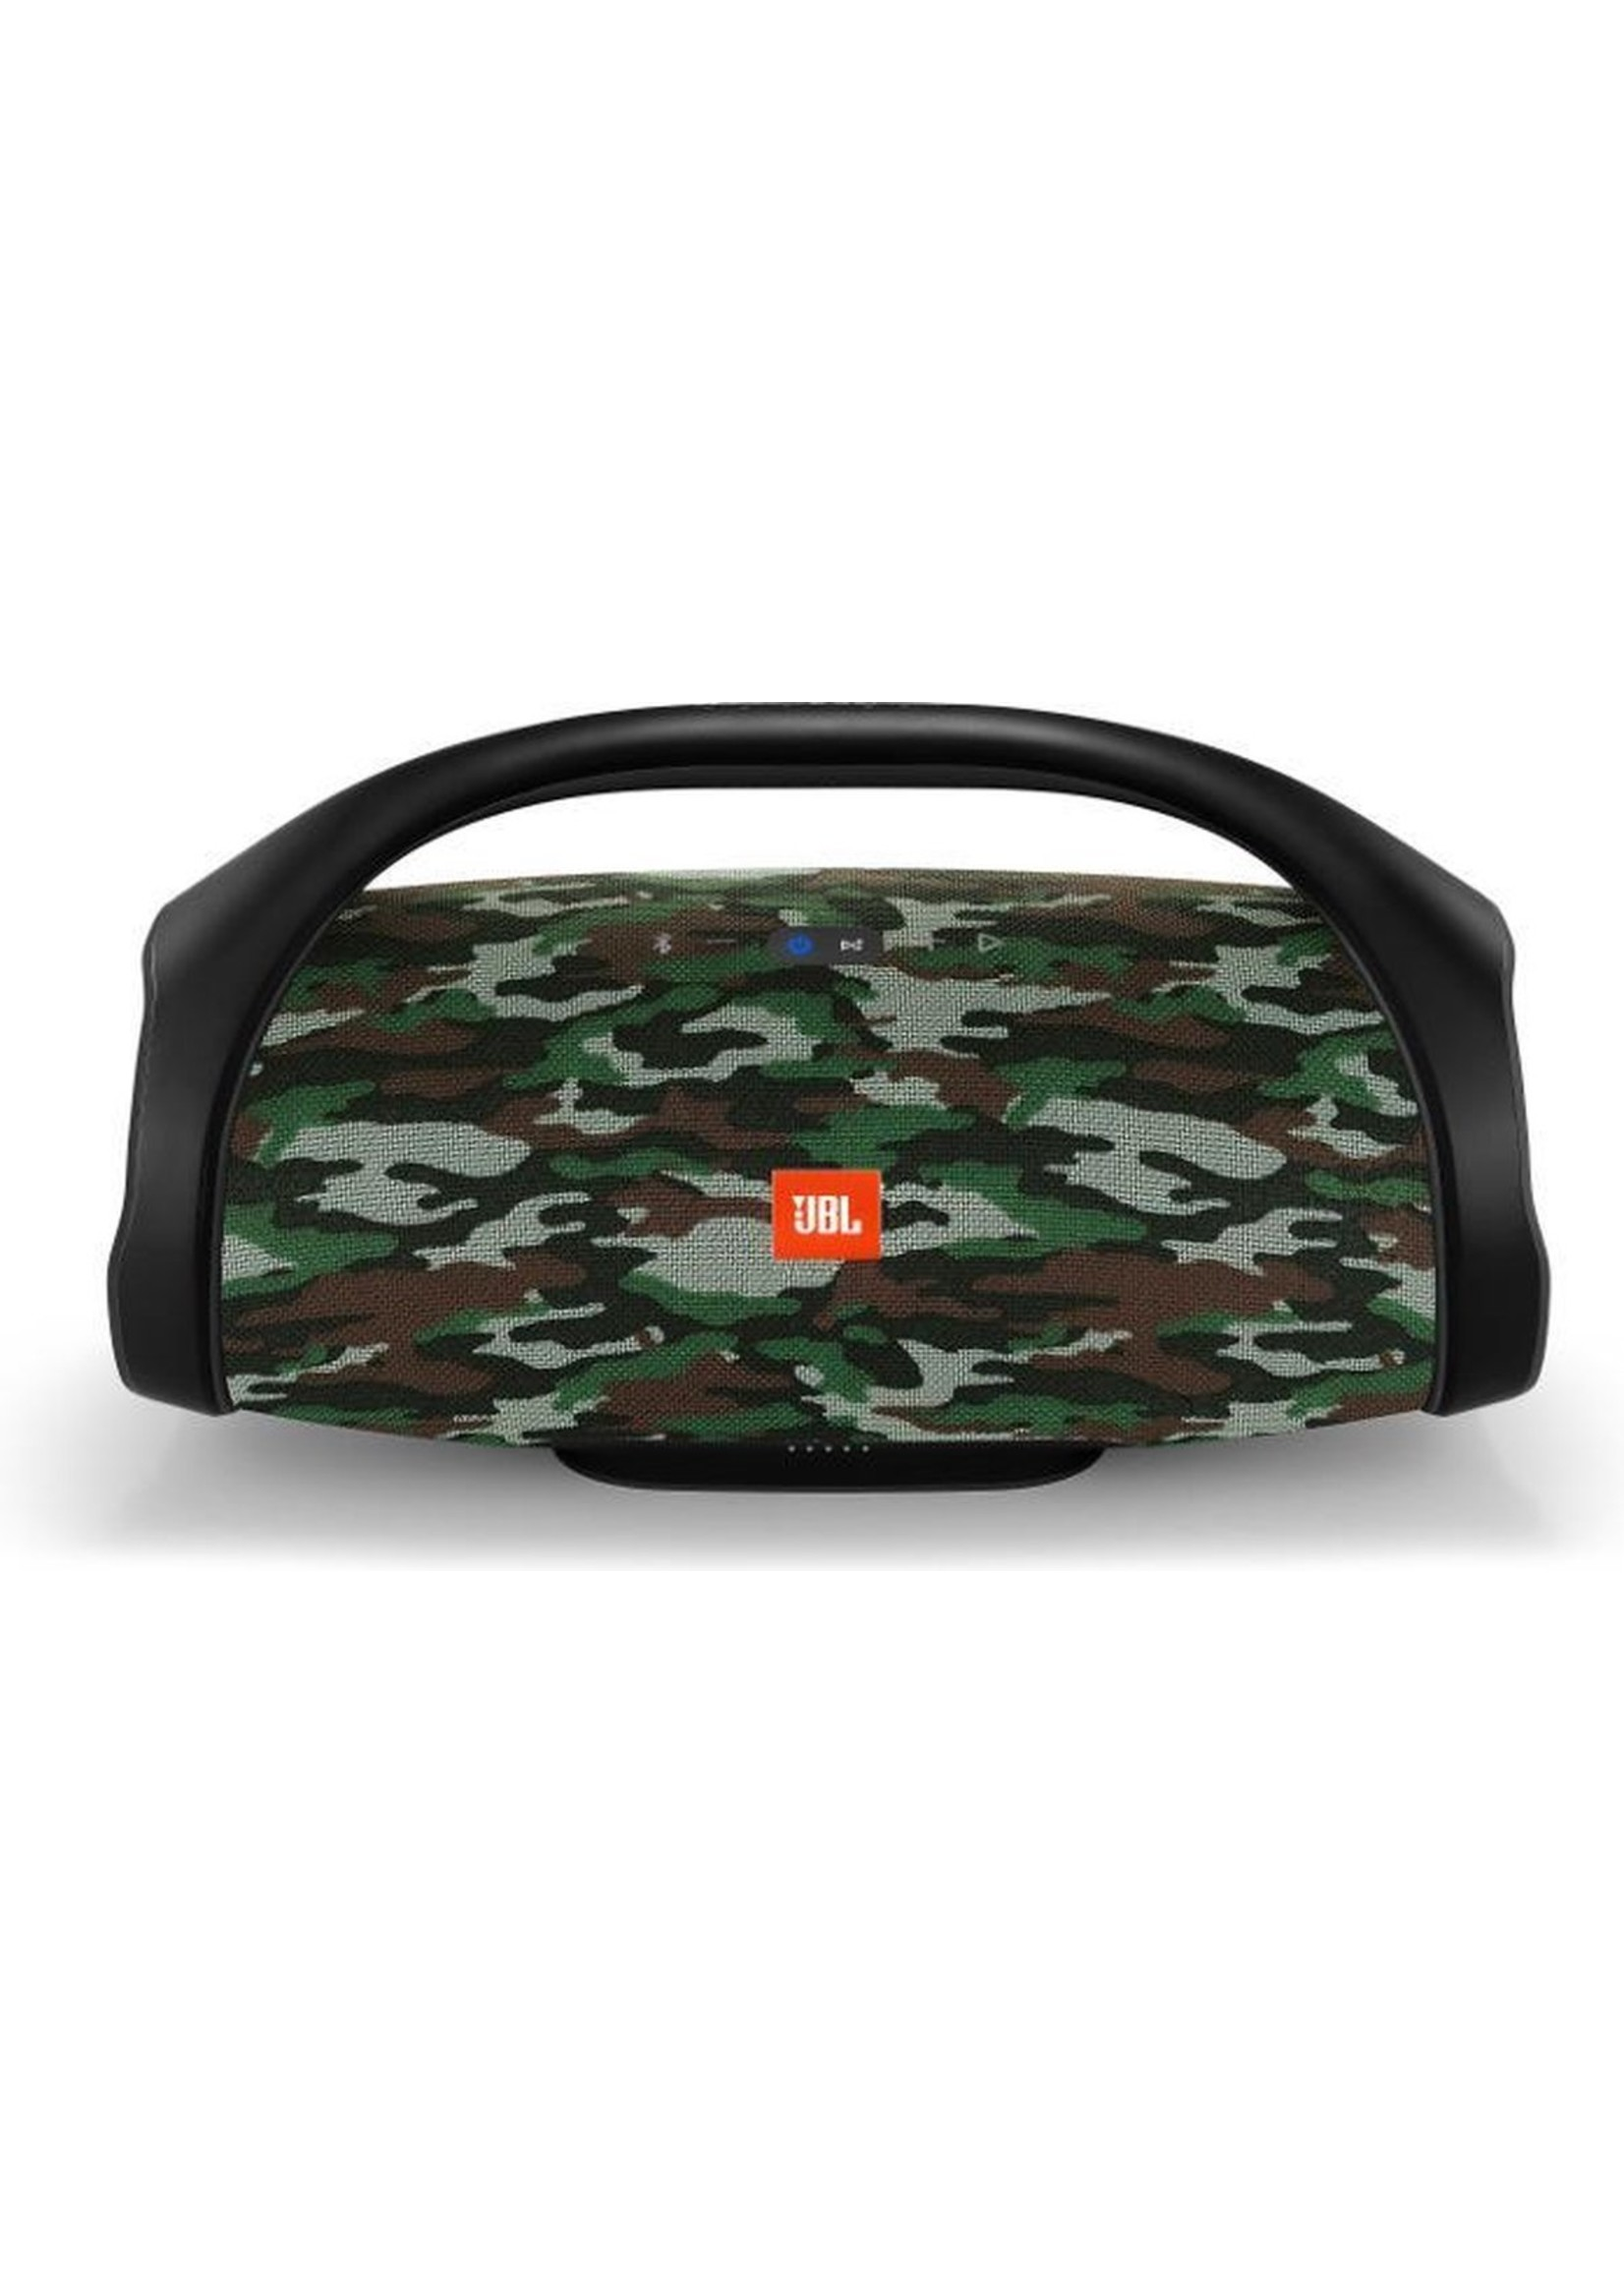 JBL JBL Boombox Squad Camouflage - Bluetooth Speaker koopjeshoek